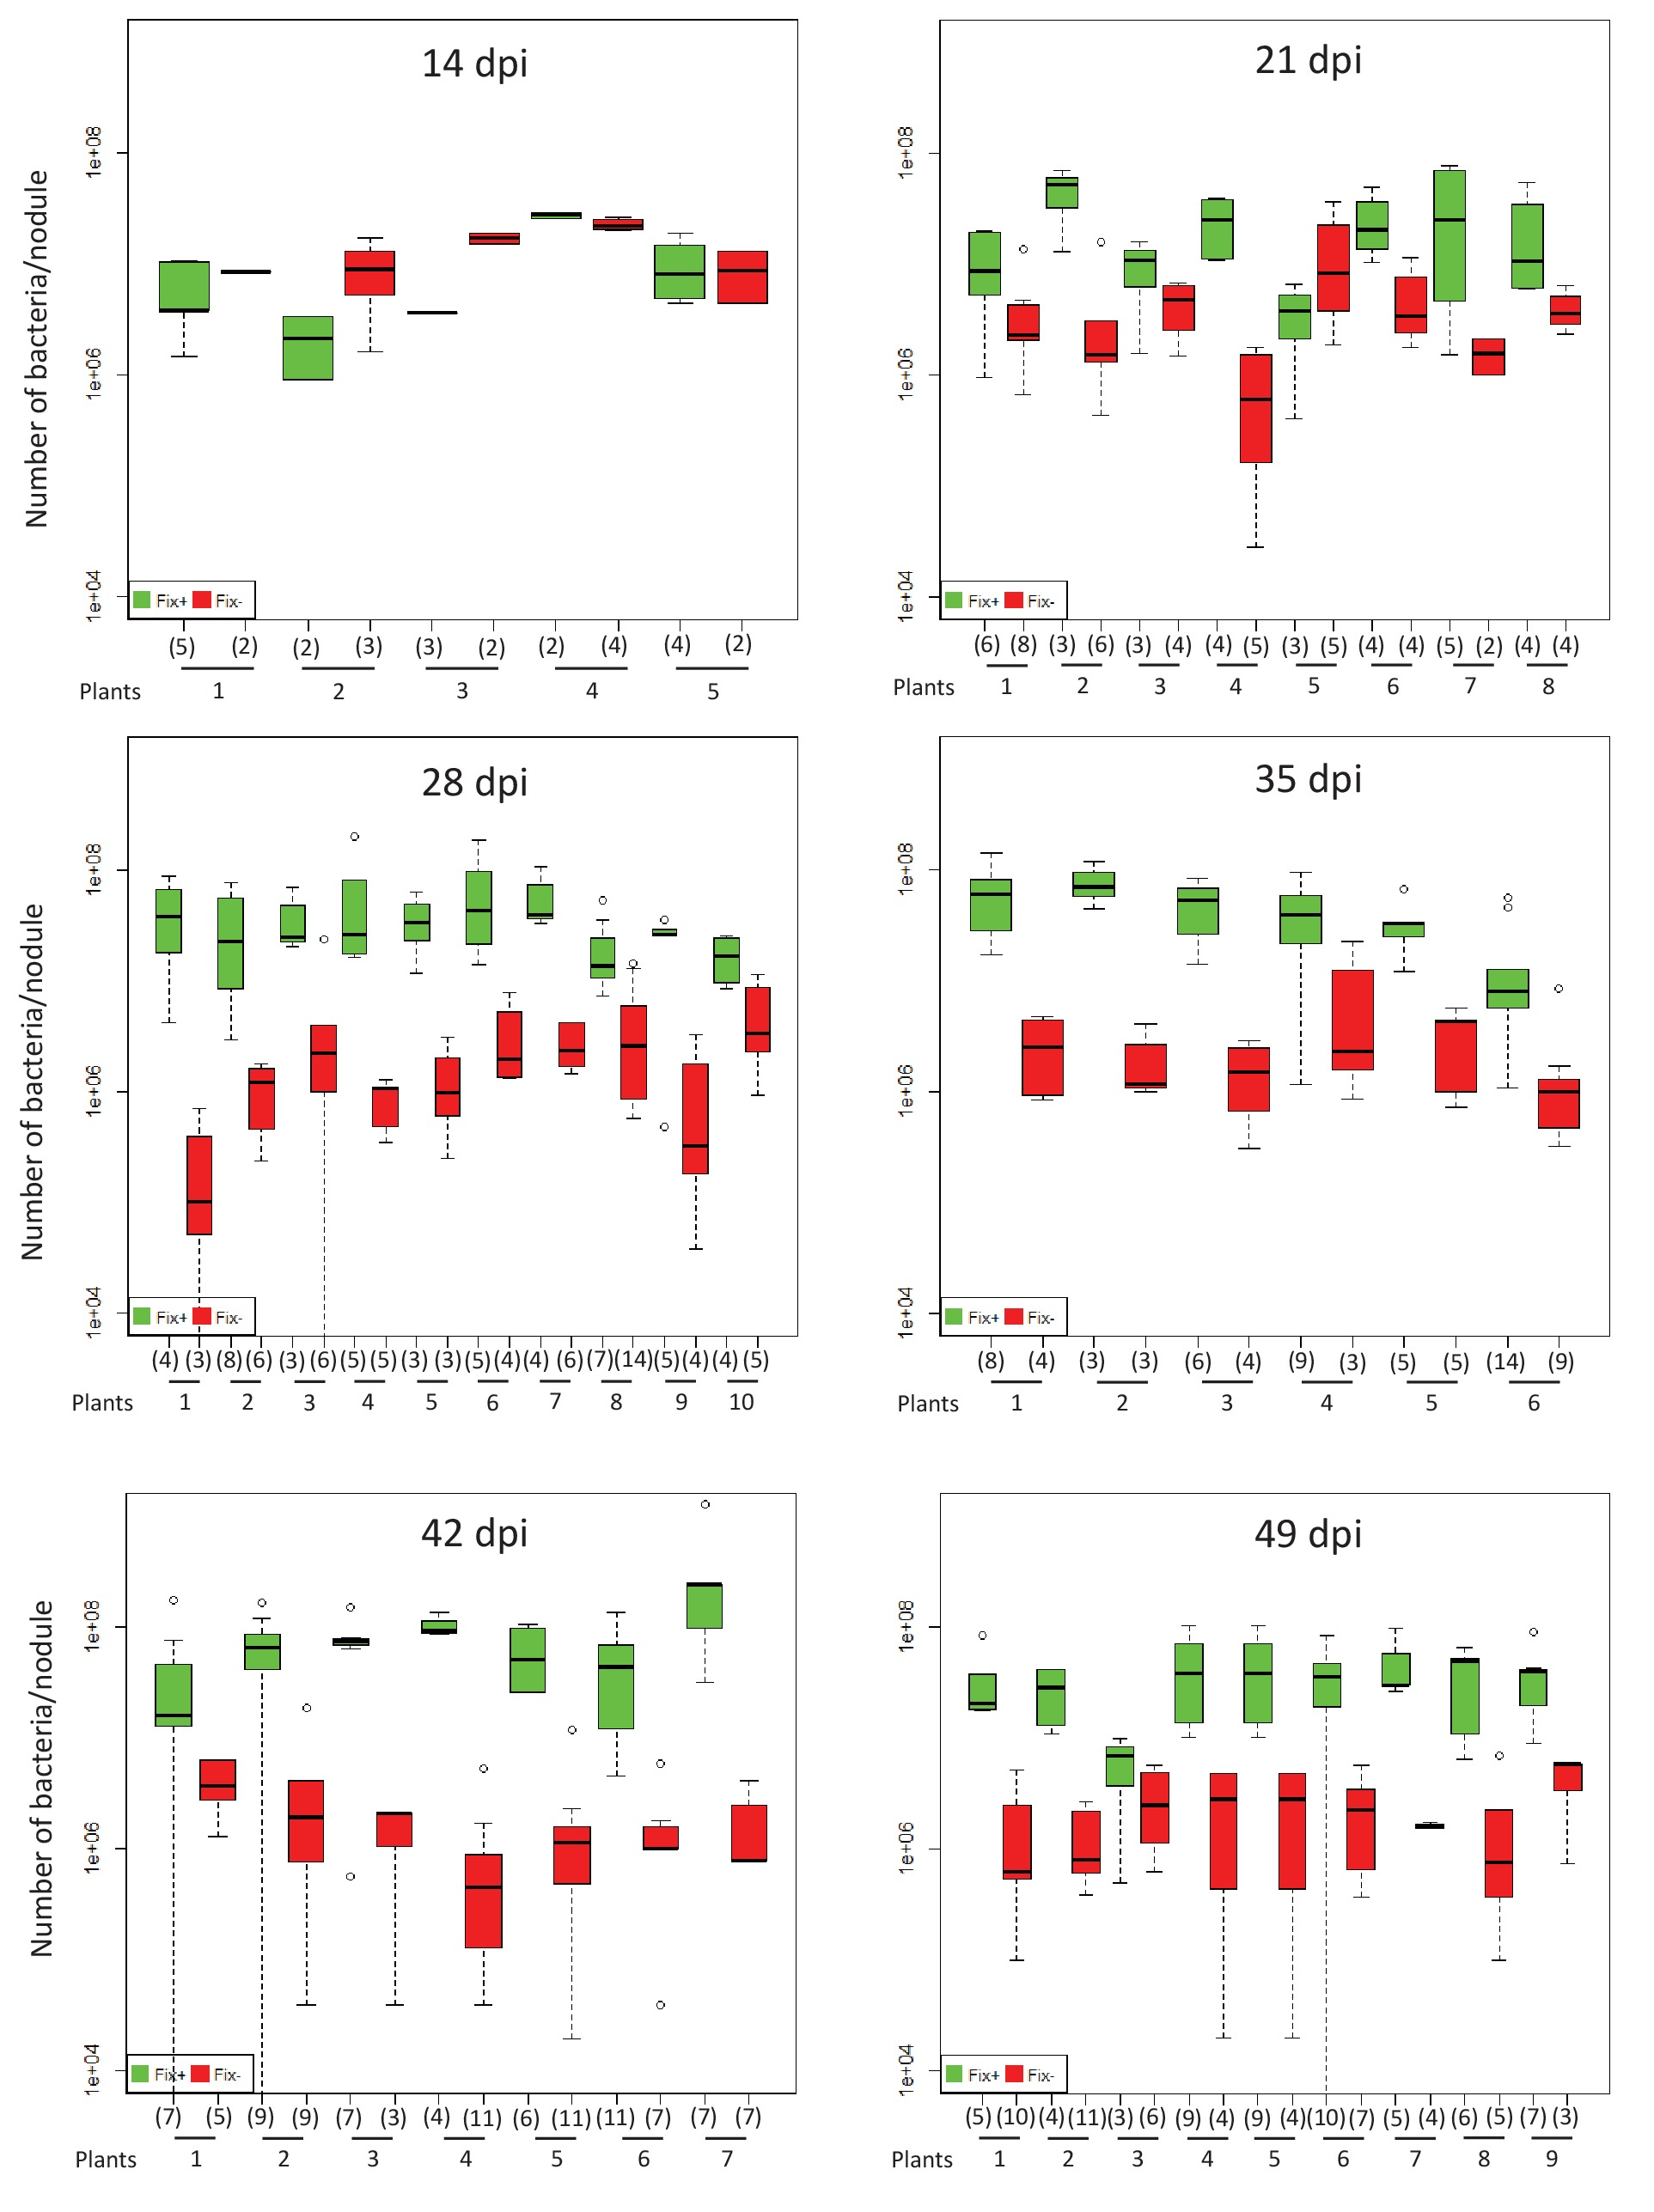 Spatio-temporal control of mutualism in legumes helps spread